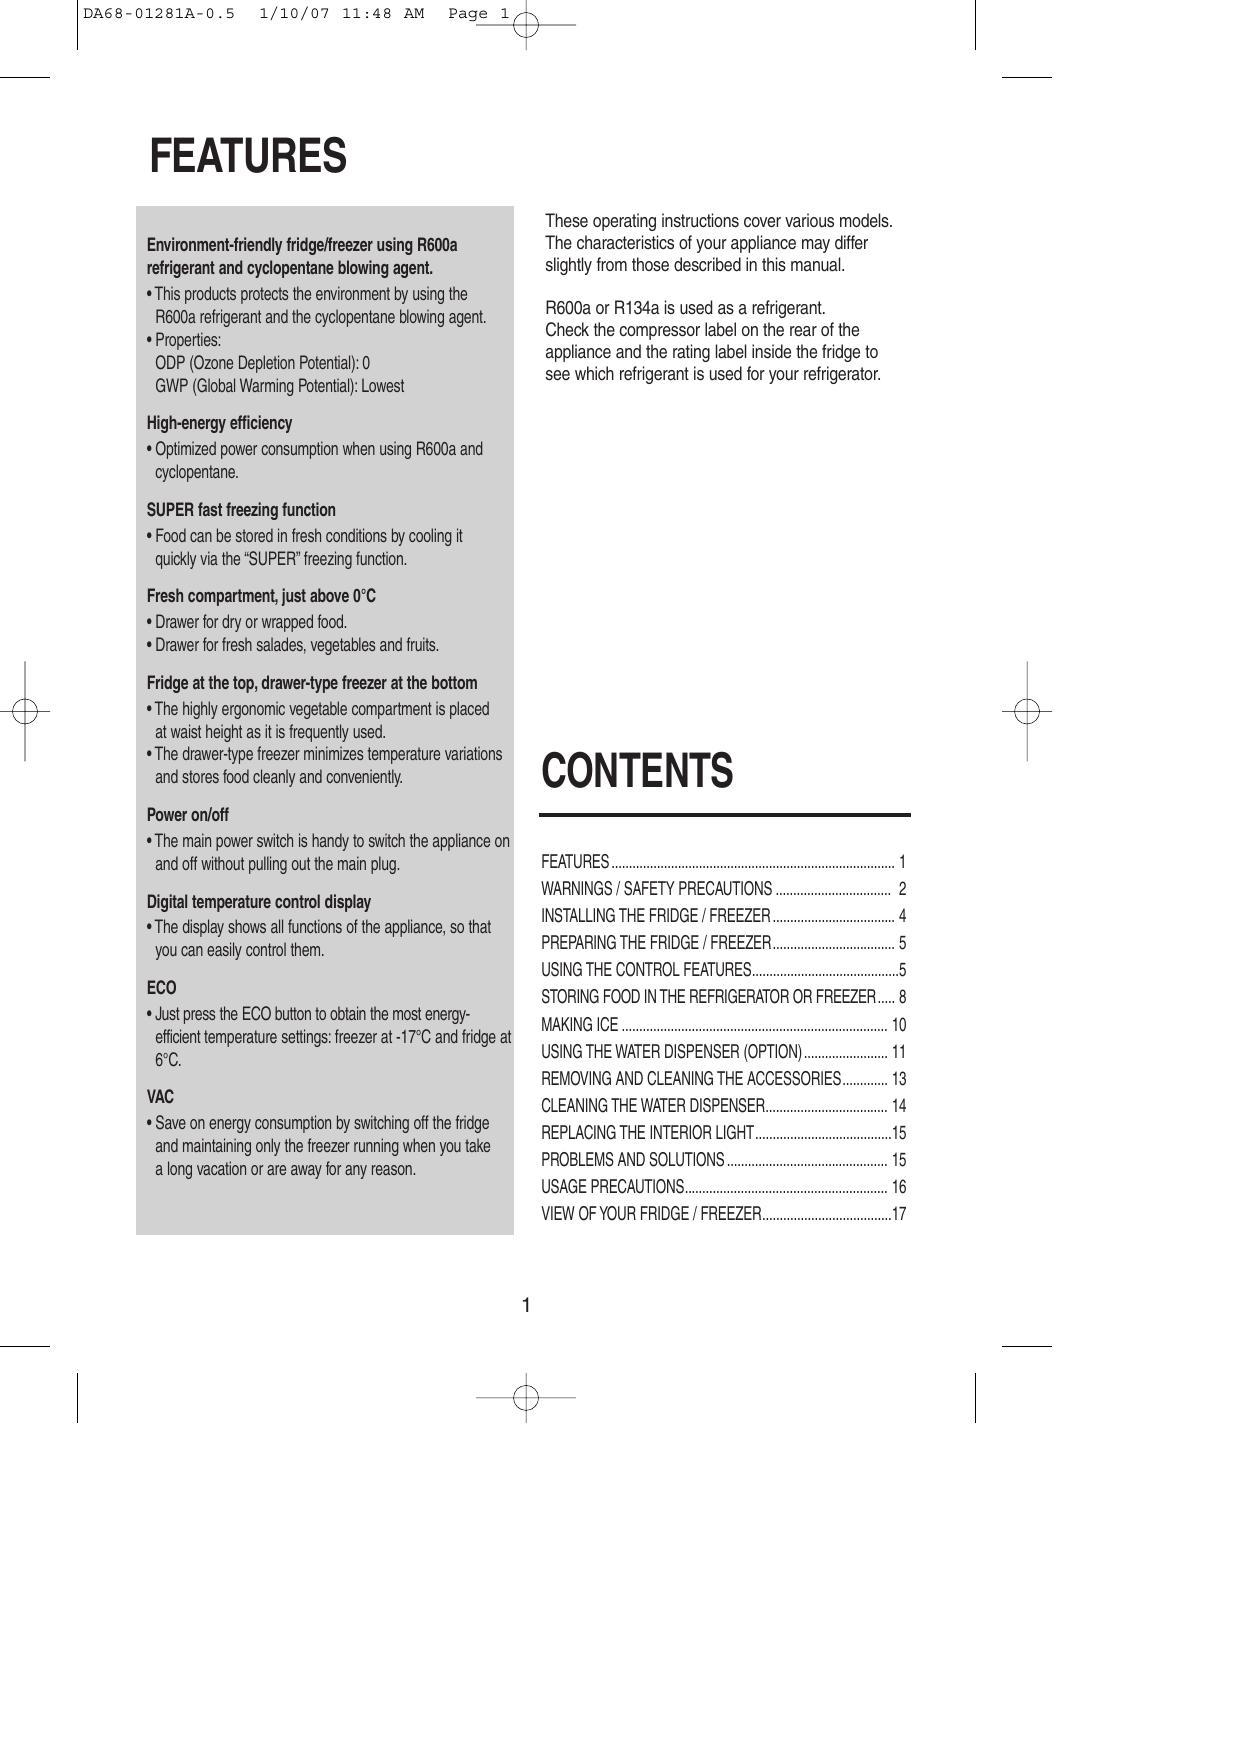 Samsung RL38SBSW User manual | manualzz com